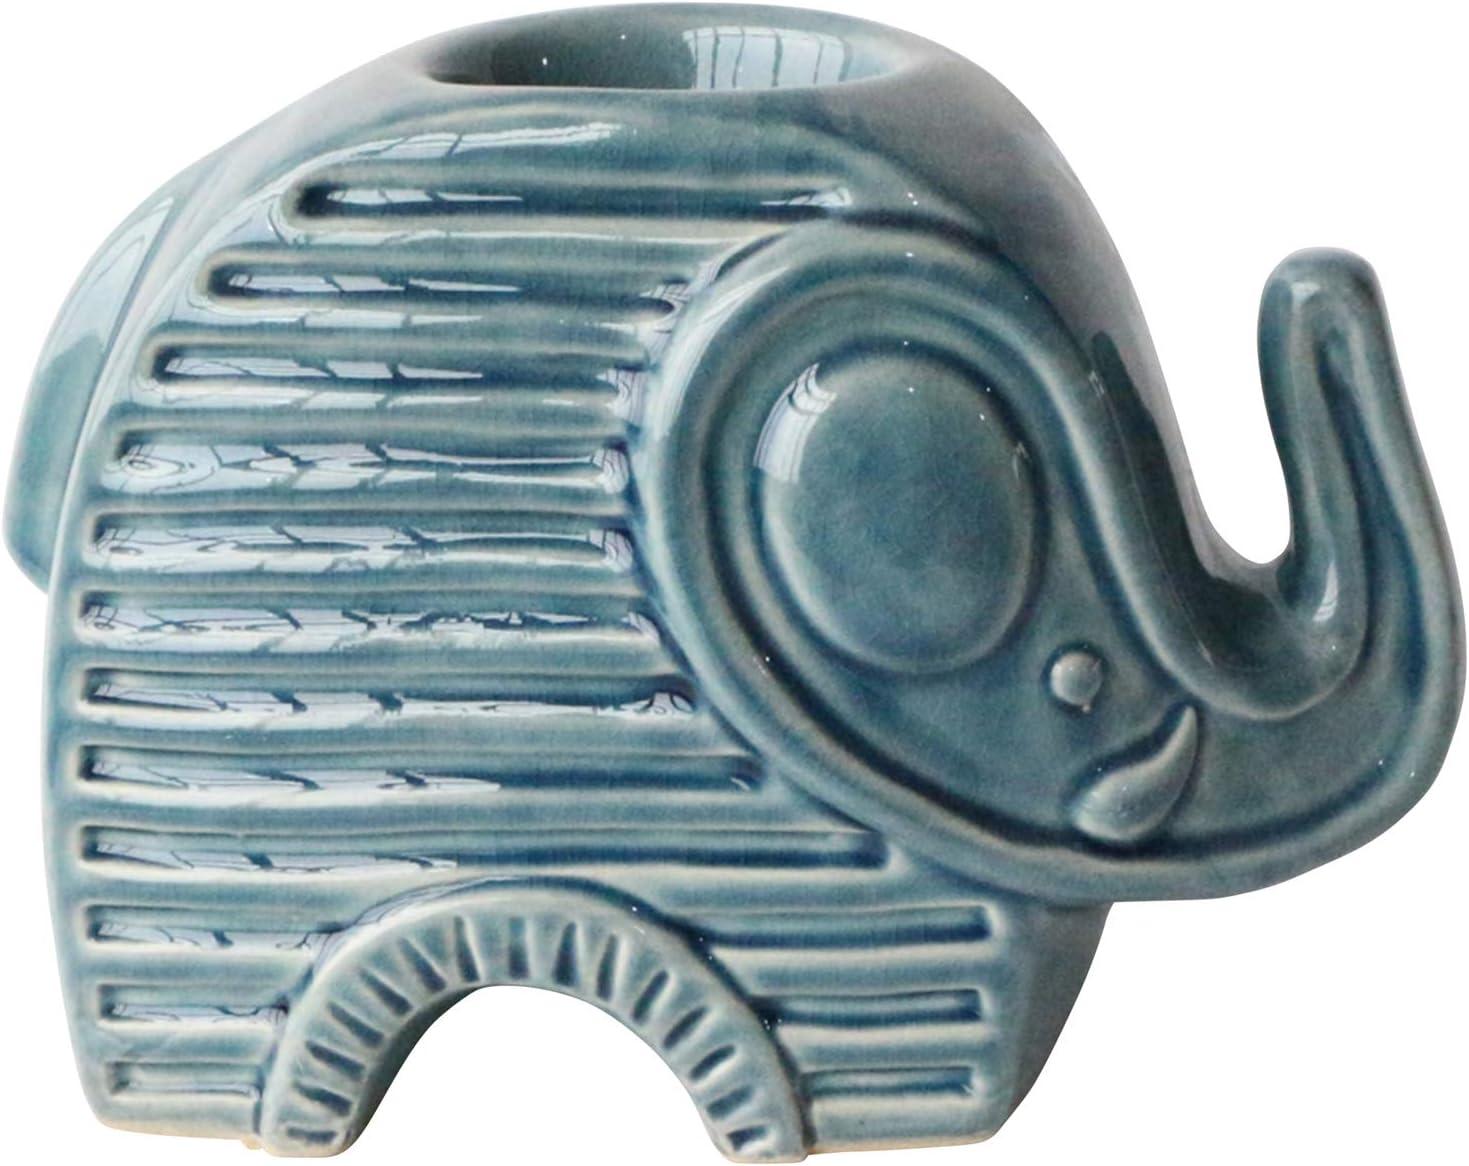 "Sagebrook Home 14954-03 Ceramic 6"" Elephant Tea Light Candle Holder, Blue, 9"" L x 5"" W x 6"" H"